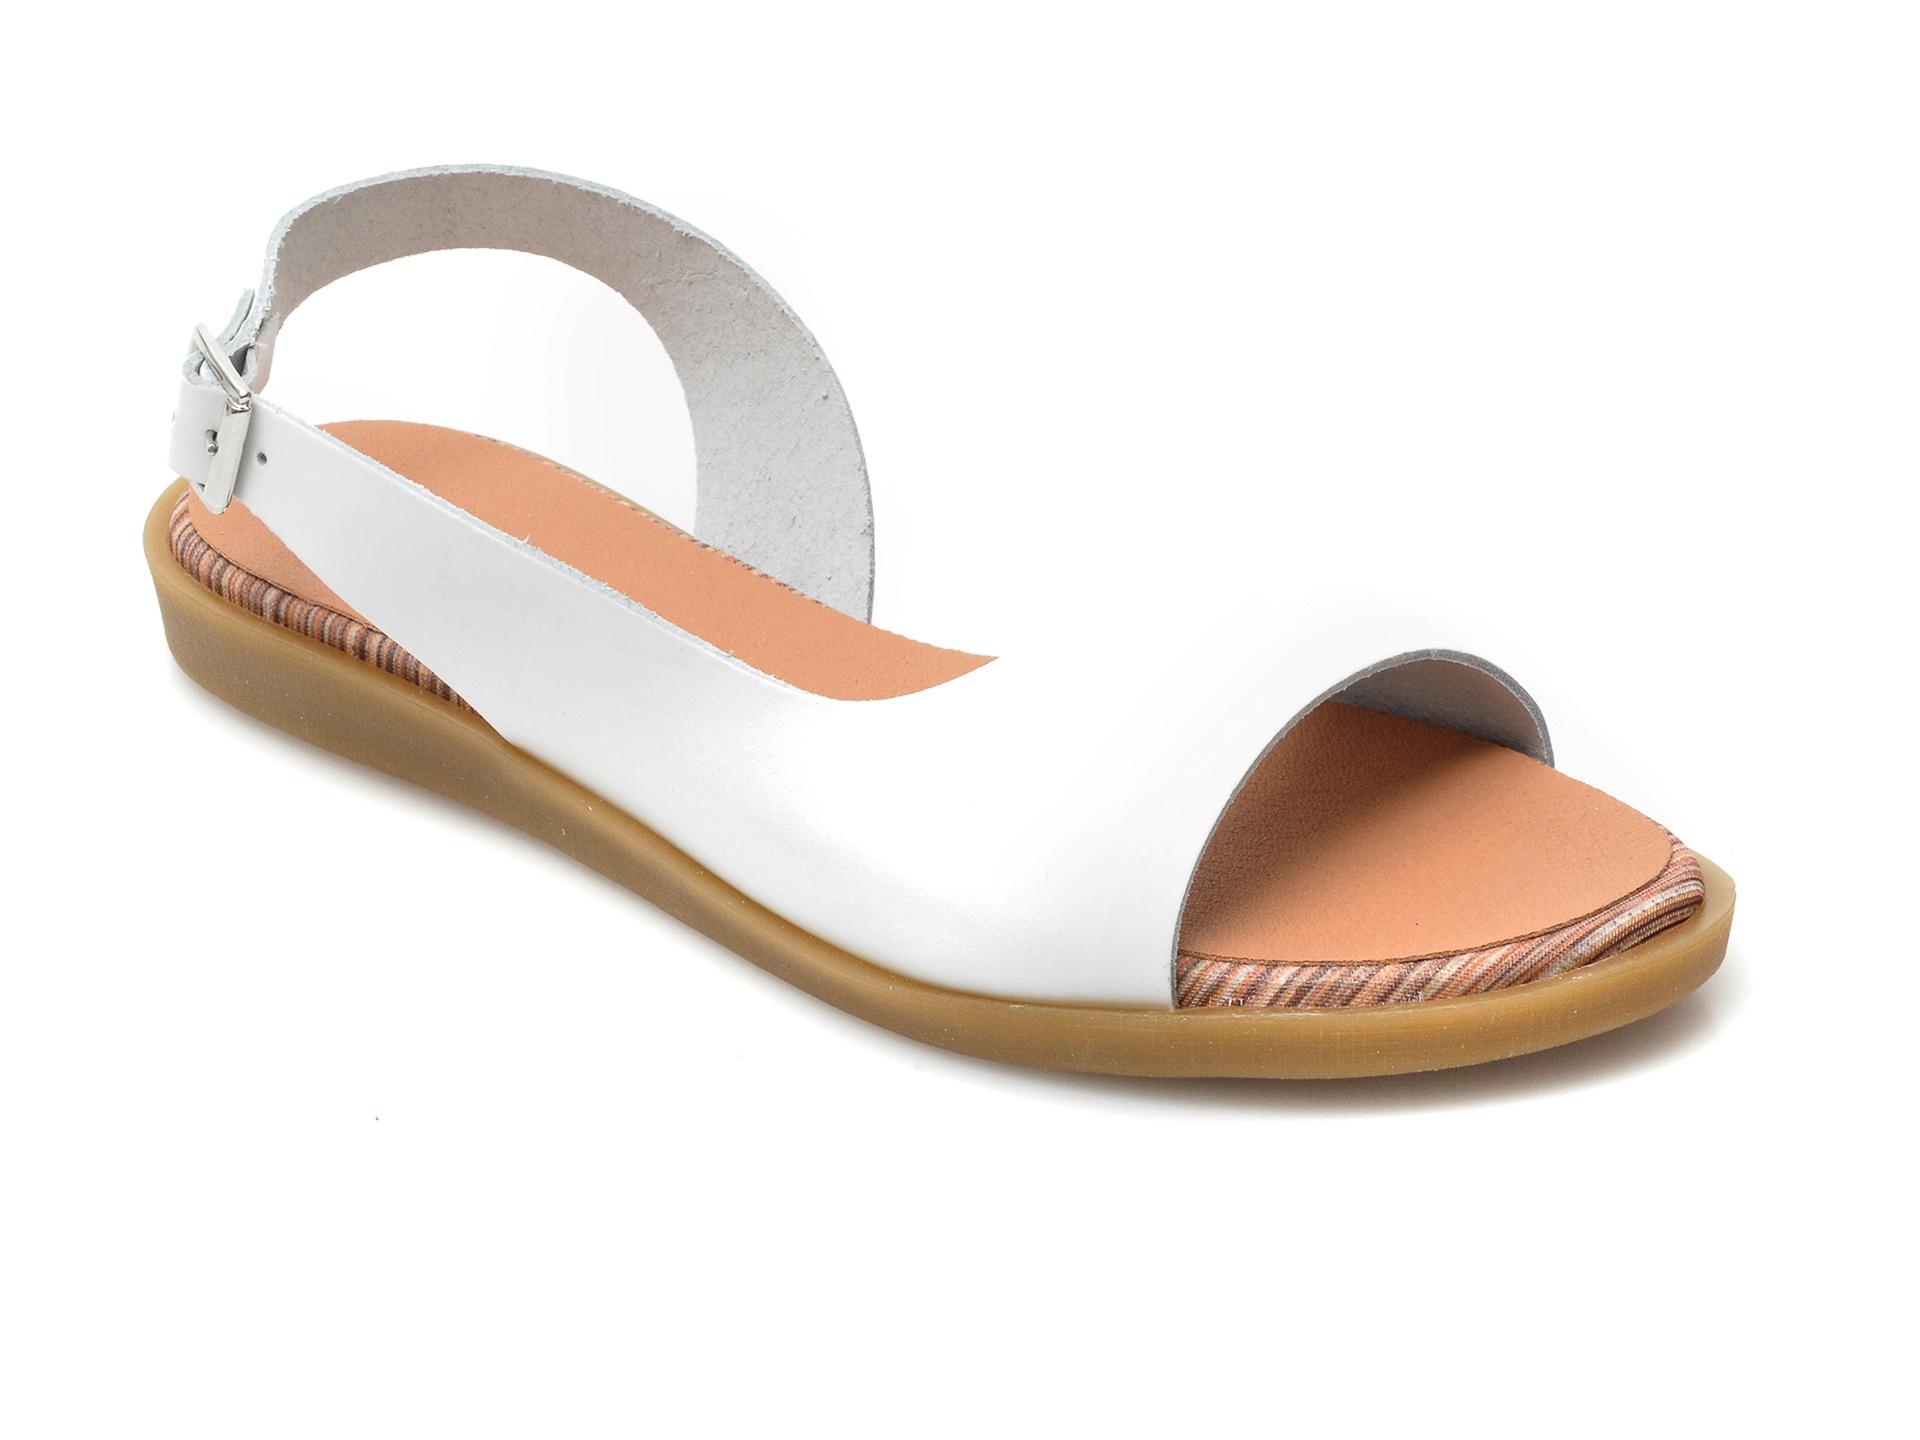 Sandale IMAGE albe, 1323, din piele naturala imagine otter.ro 2021